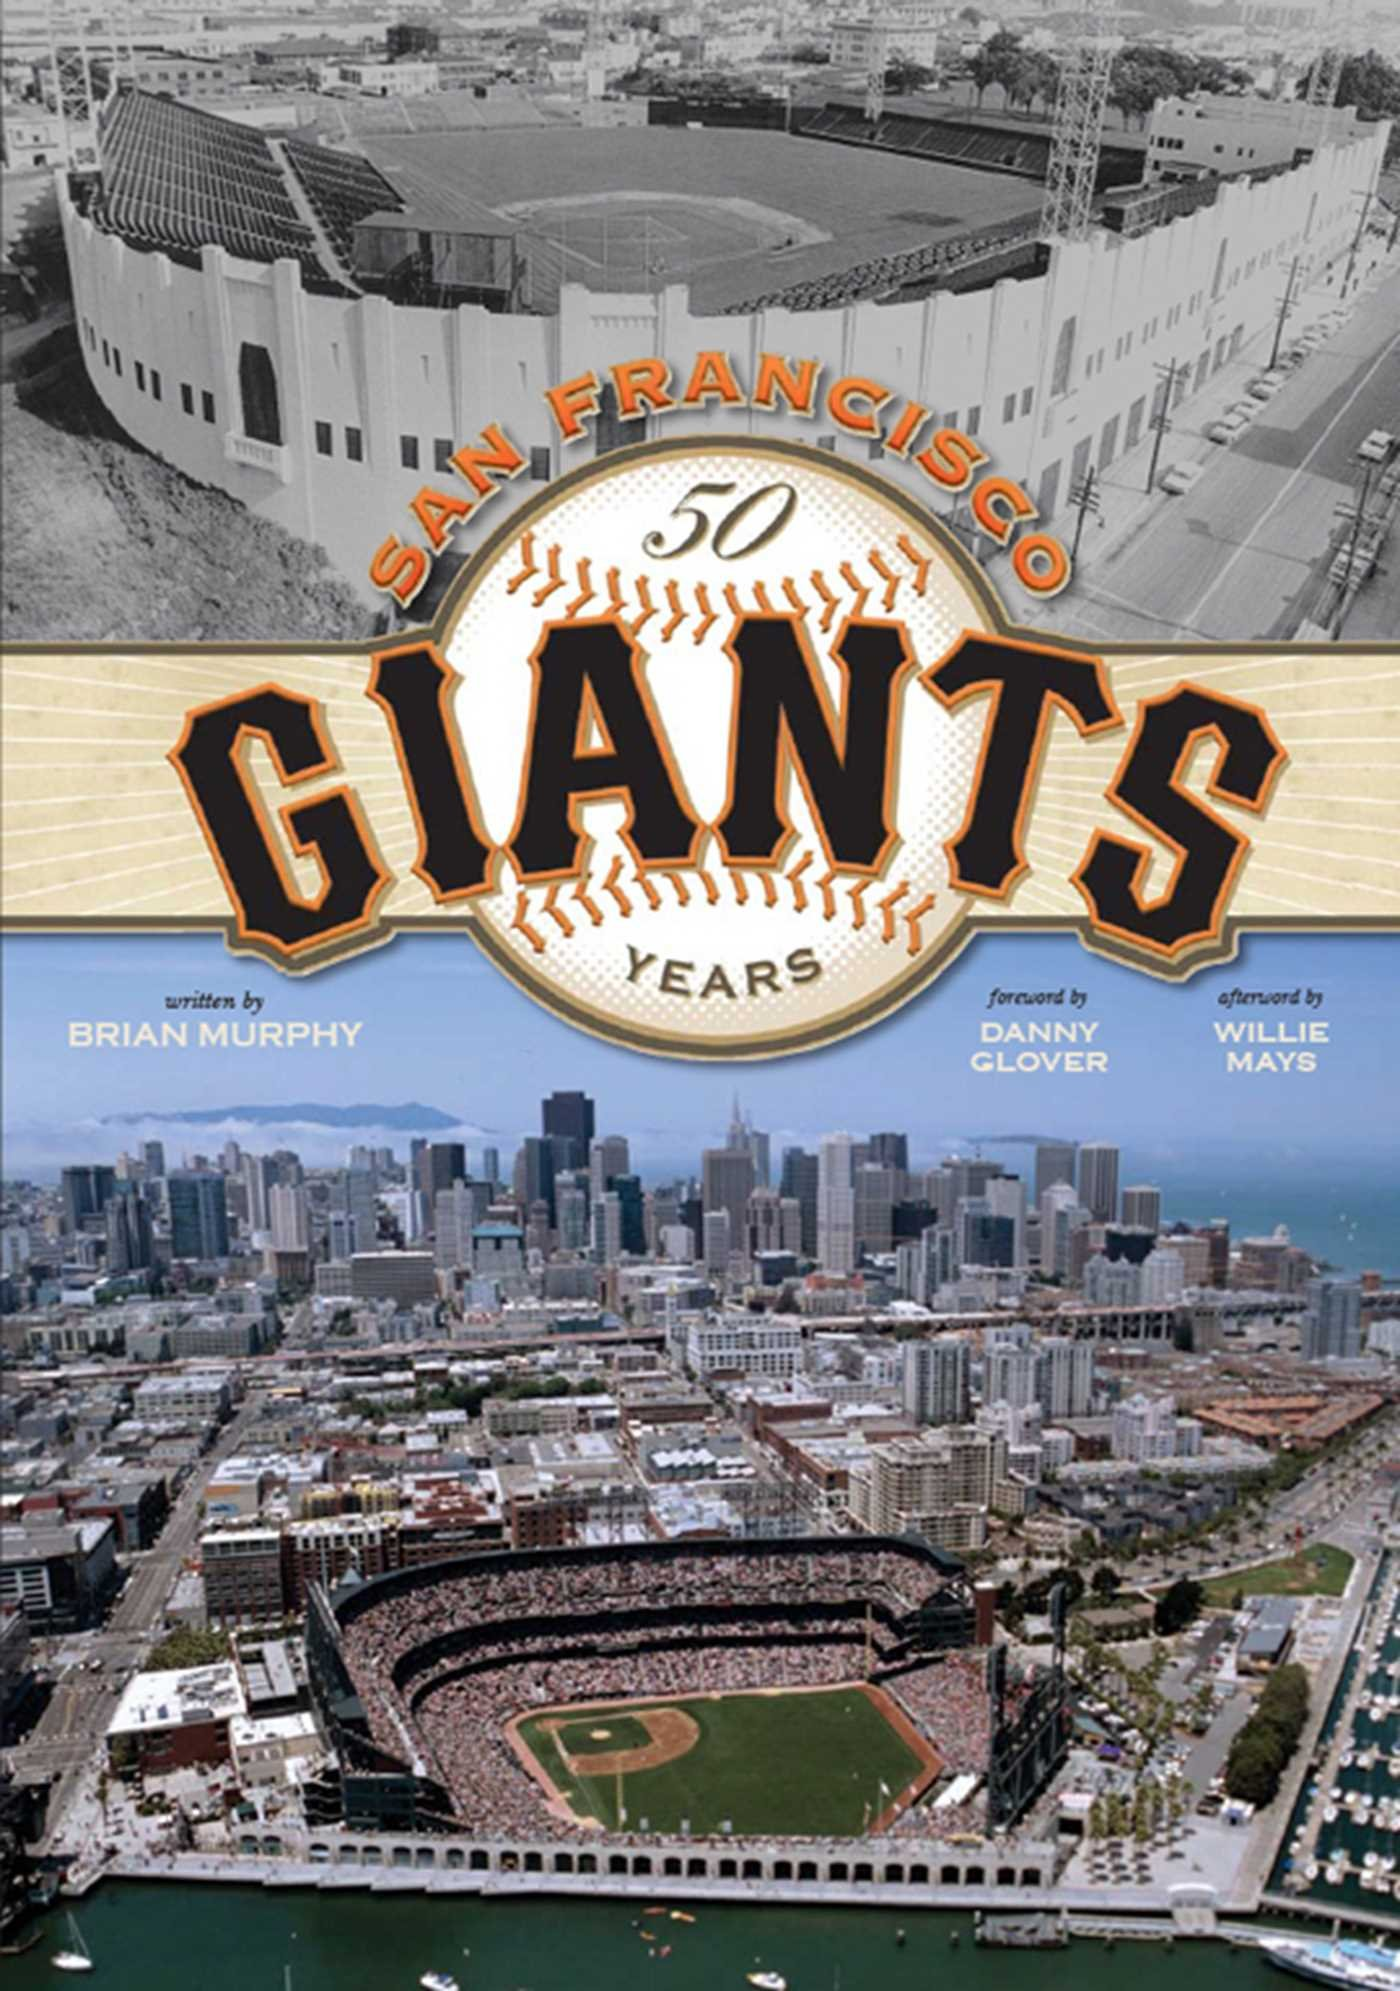 San Francisco Giants 50 Years product image